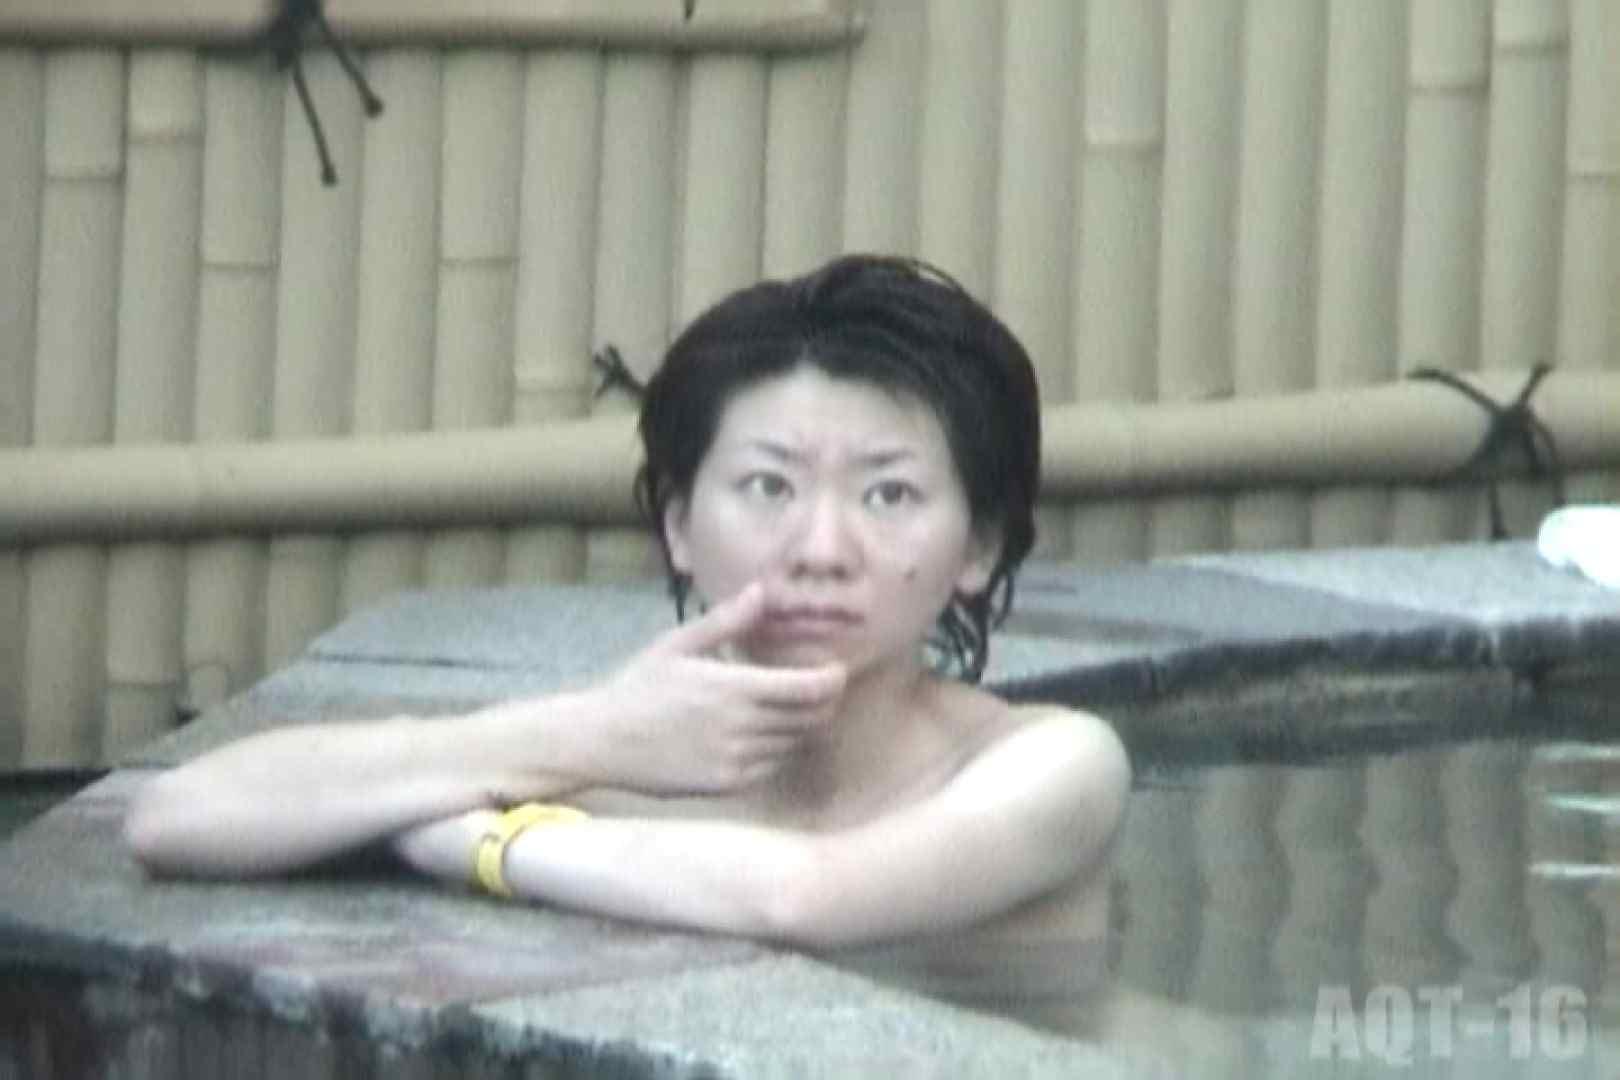 Aquaな露天風呂Vol.842 露天風呂編 | 盗撮シリーズ  82PIX 79